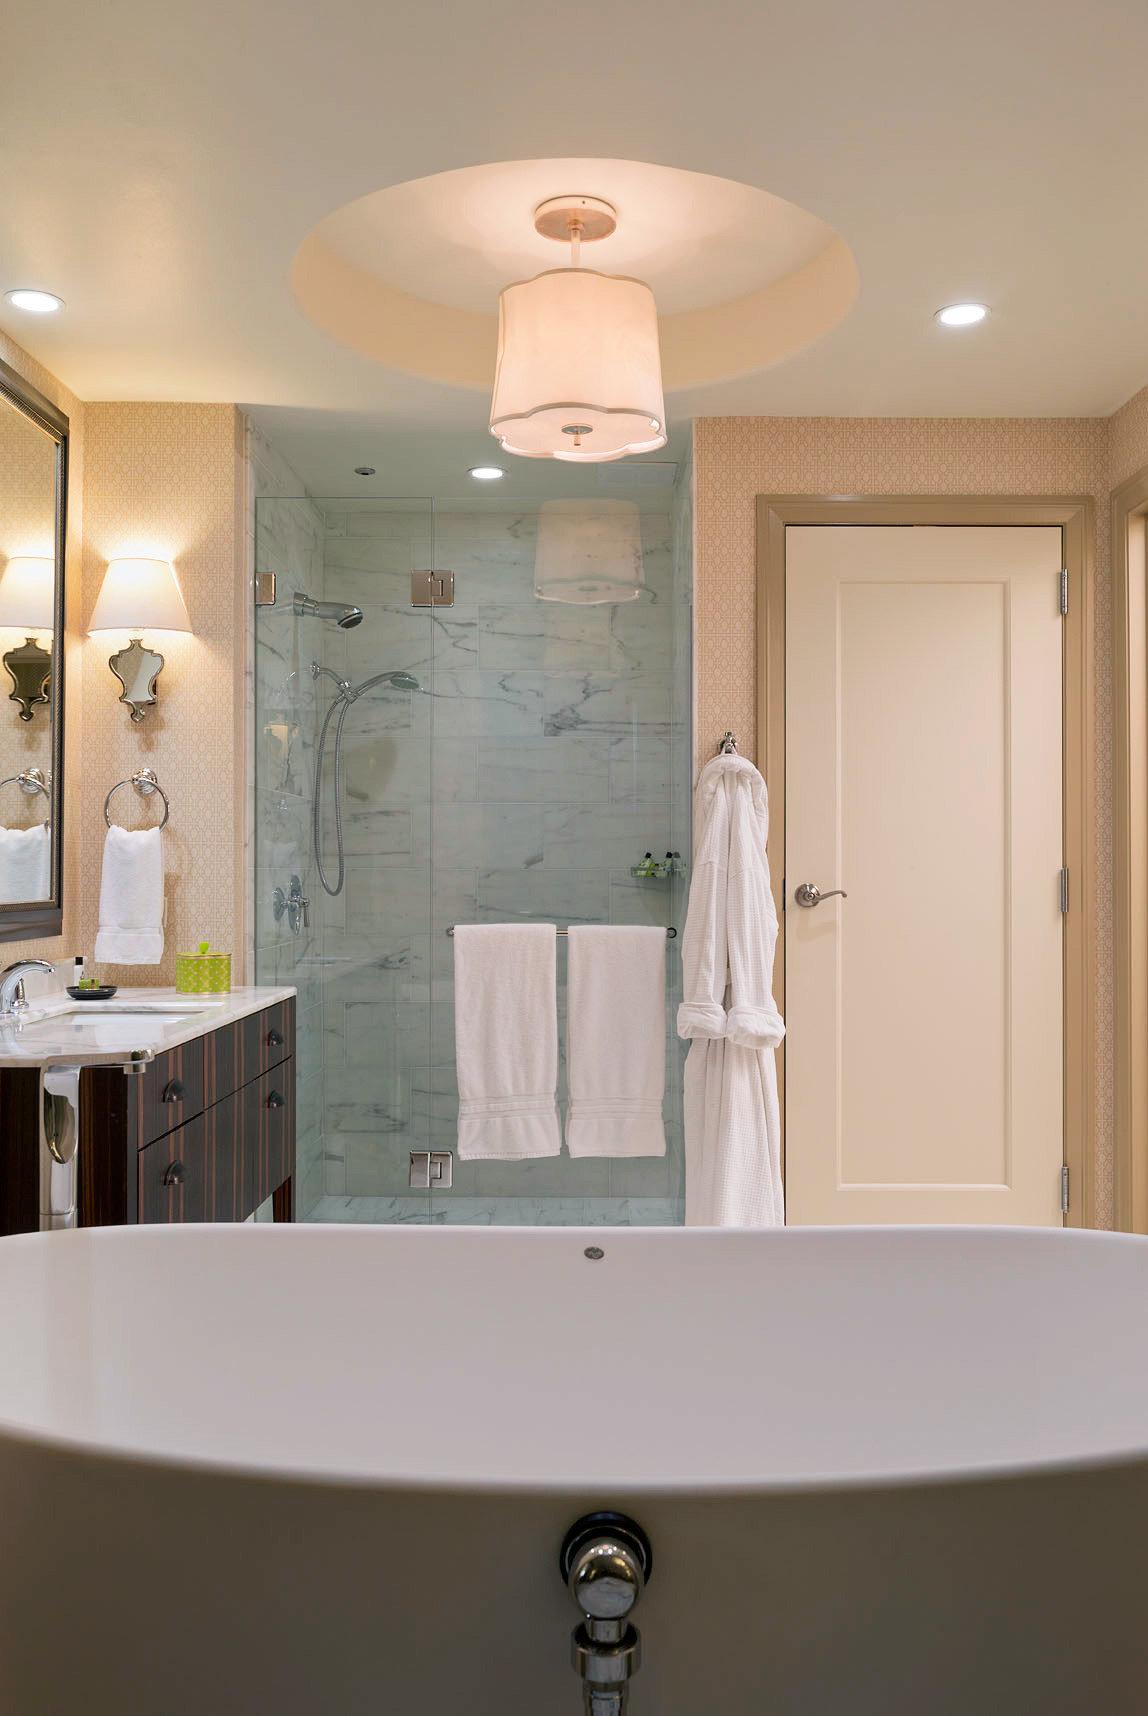 Bath Classic Resort bathroom tub home lighting plumbing fixture sink bathtub cabinetry